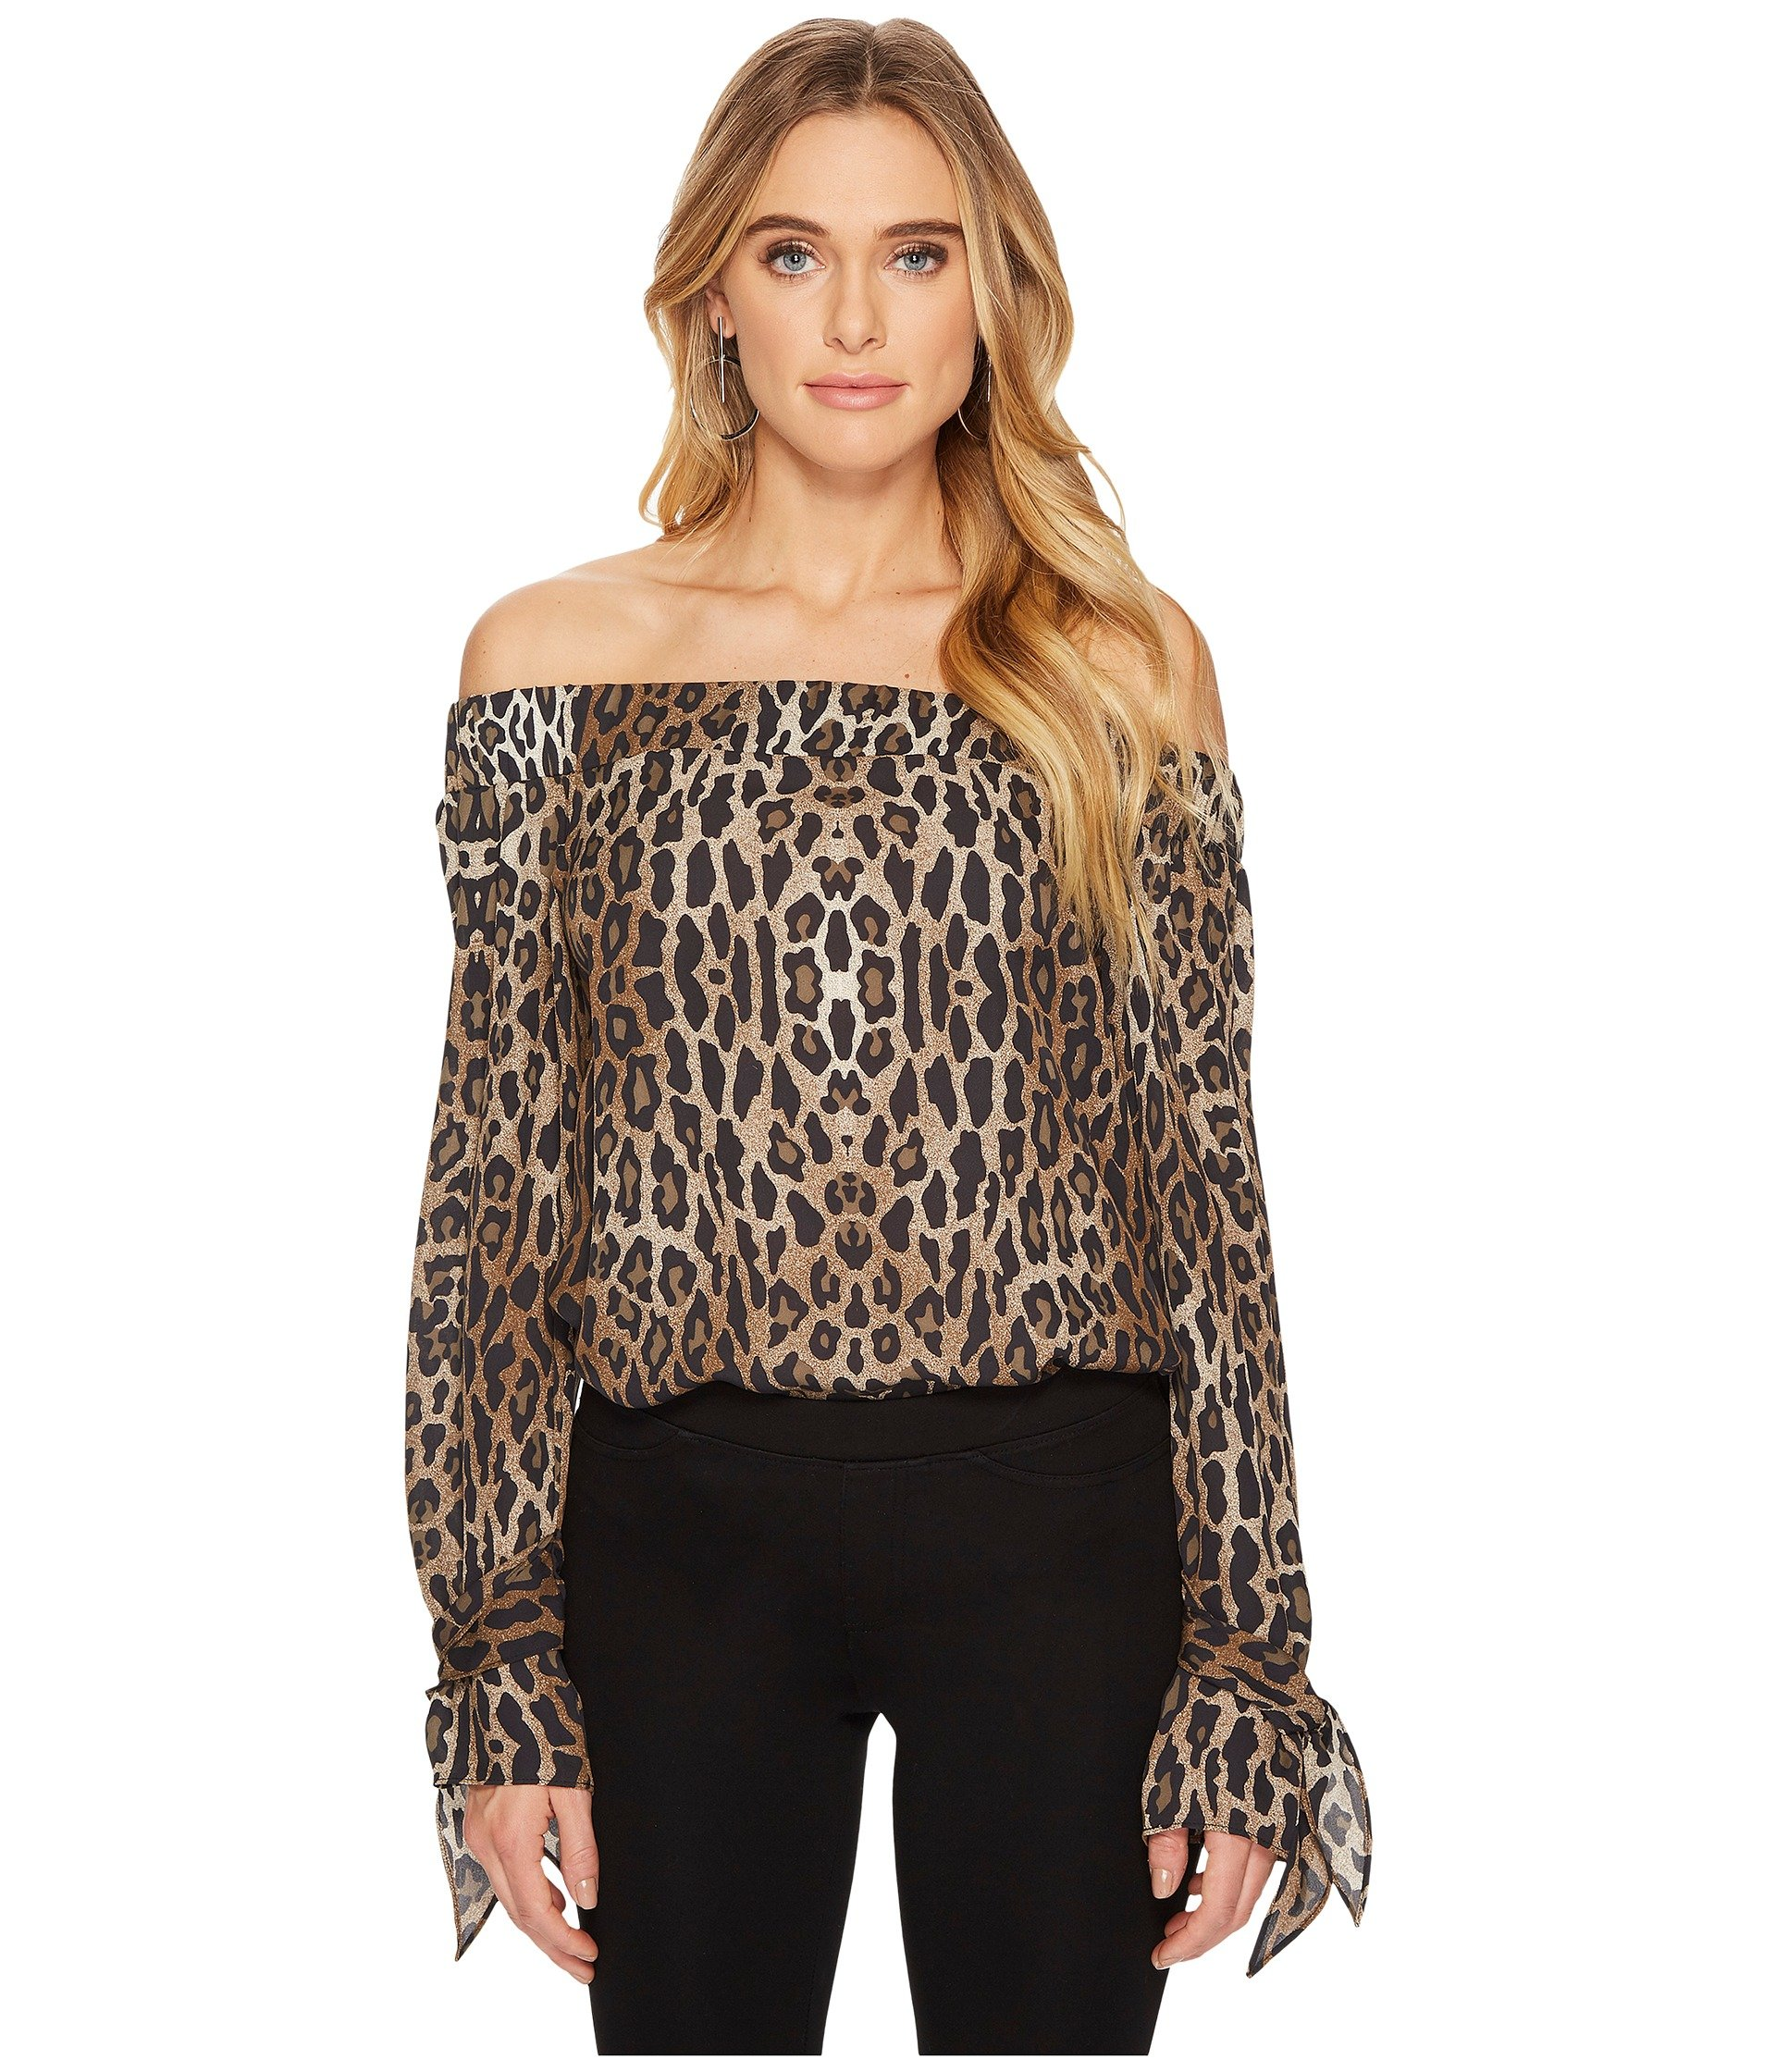 HEATHER Lita Off The Shoulder Blouse, Cheetah